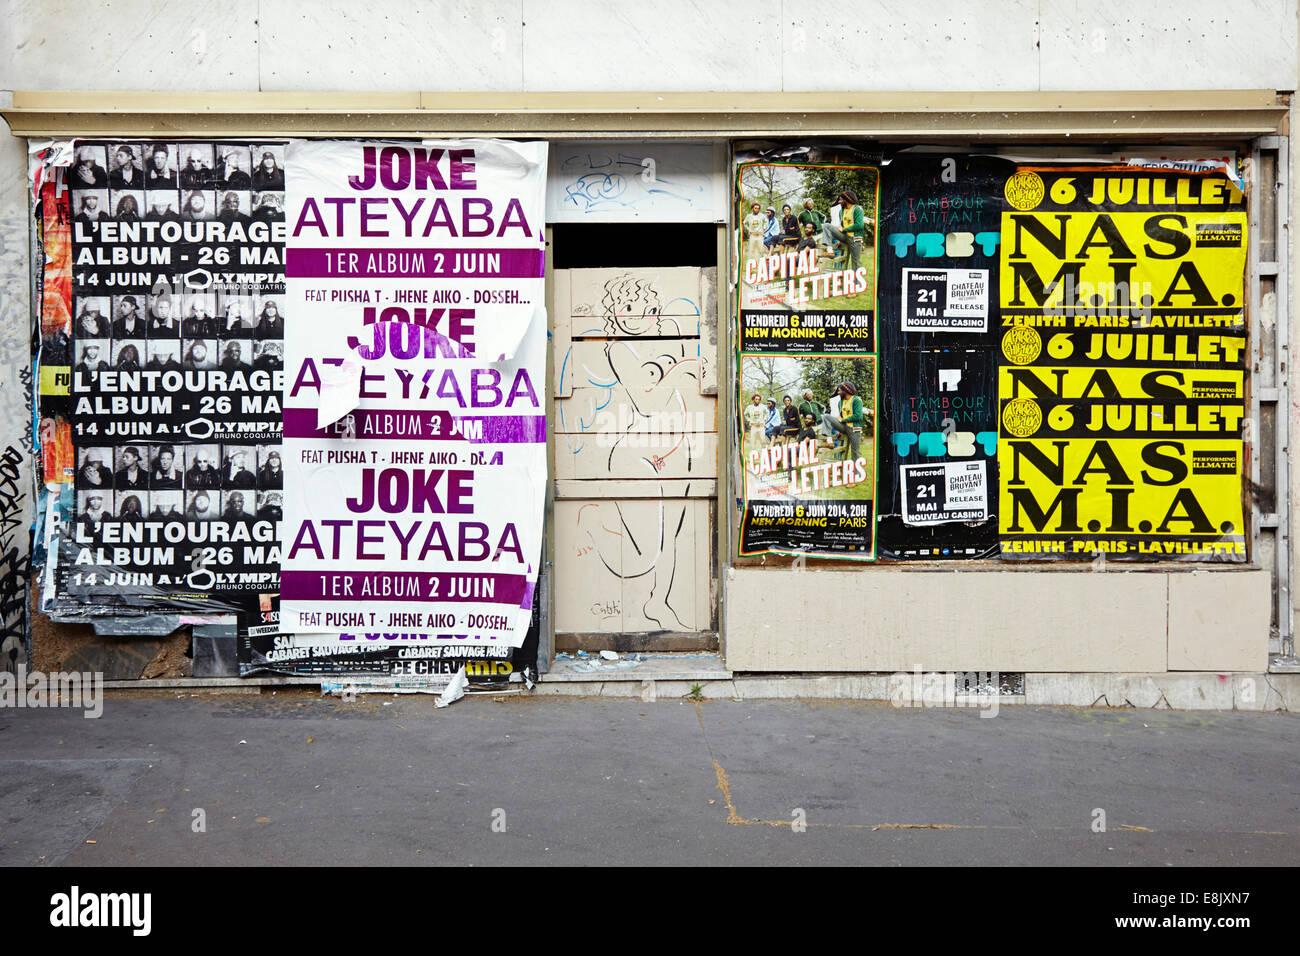 Posters and doorway in Paris - Stock Image